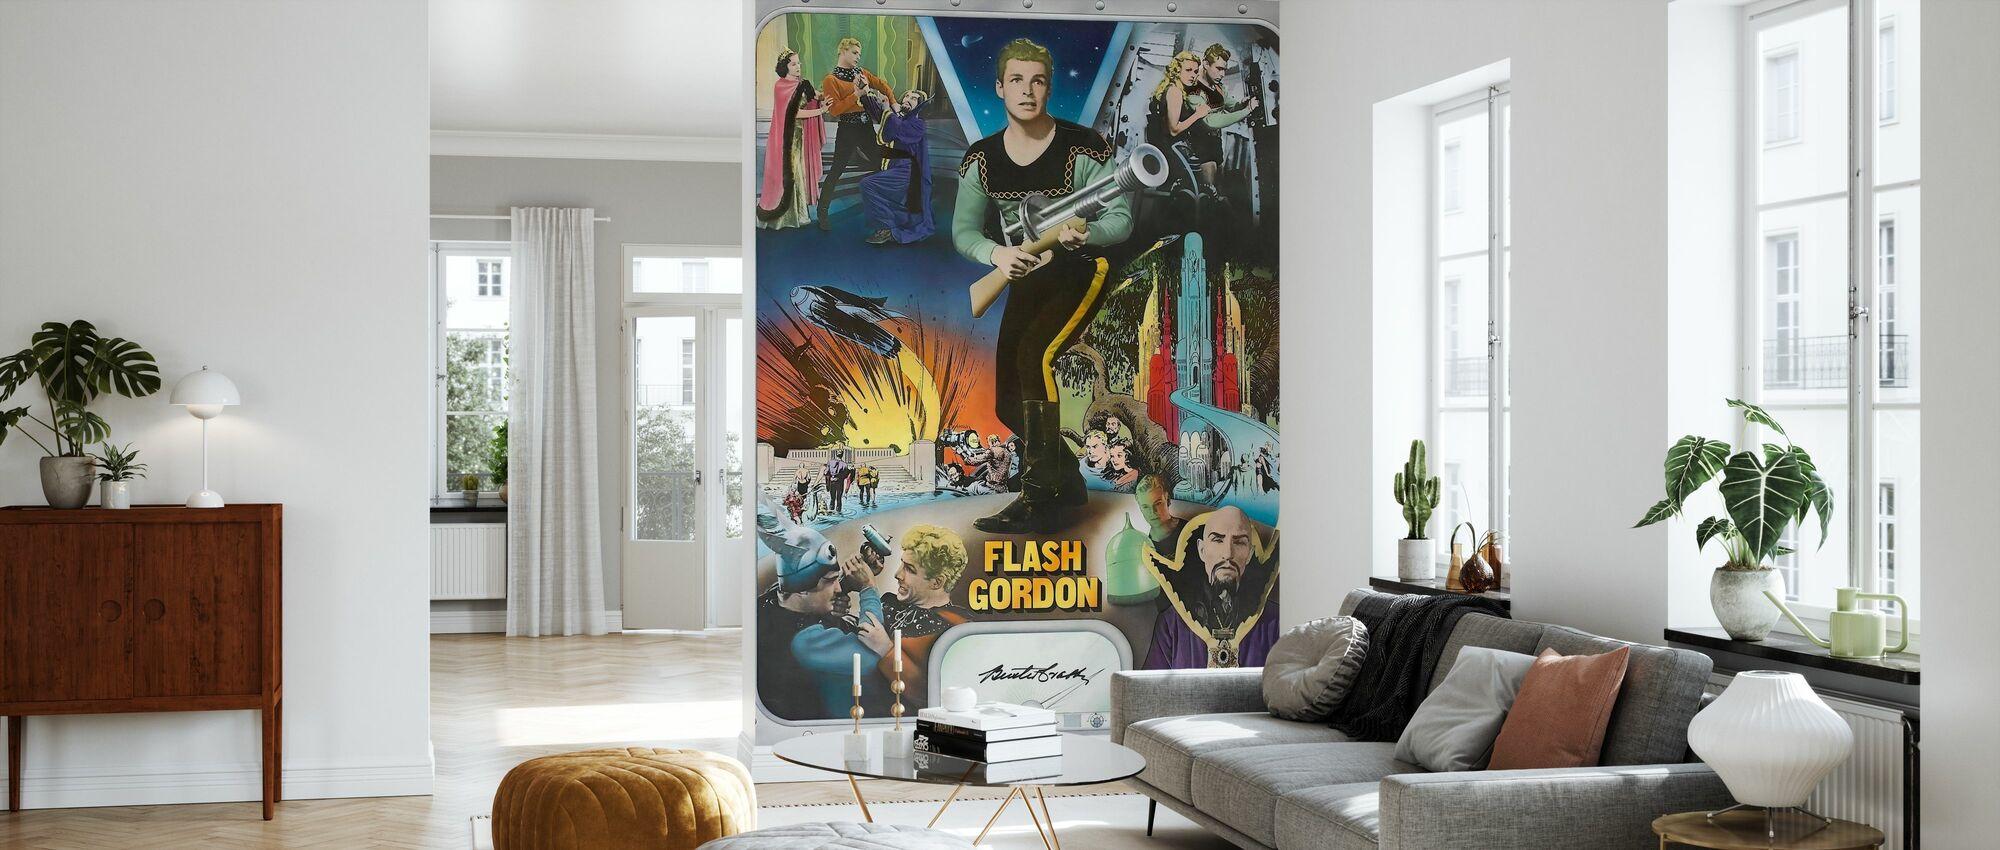 Flash Gordon - Ray Taylor and Frederick Stephani - Wallpaper - Living Room